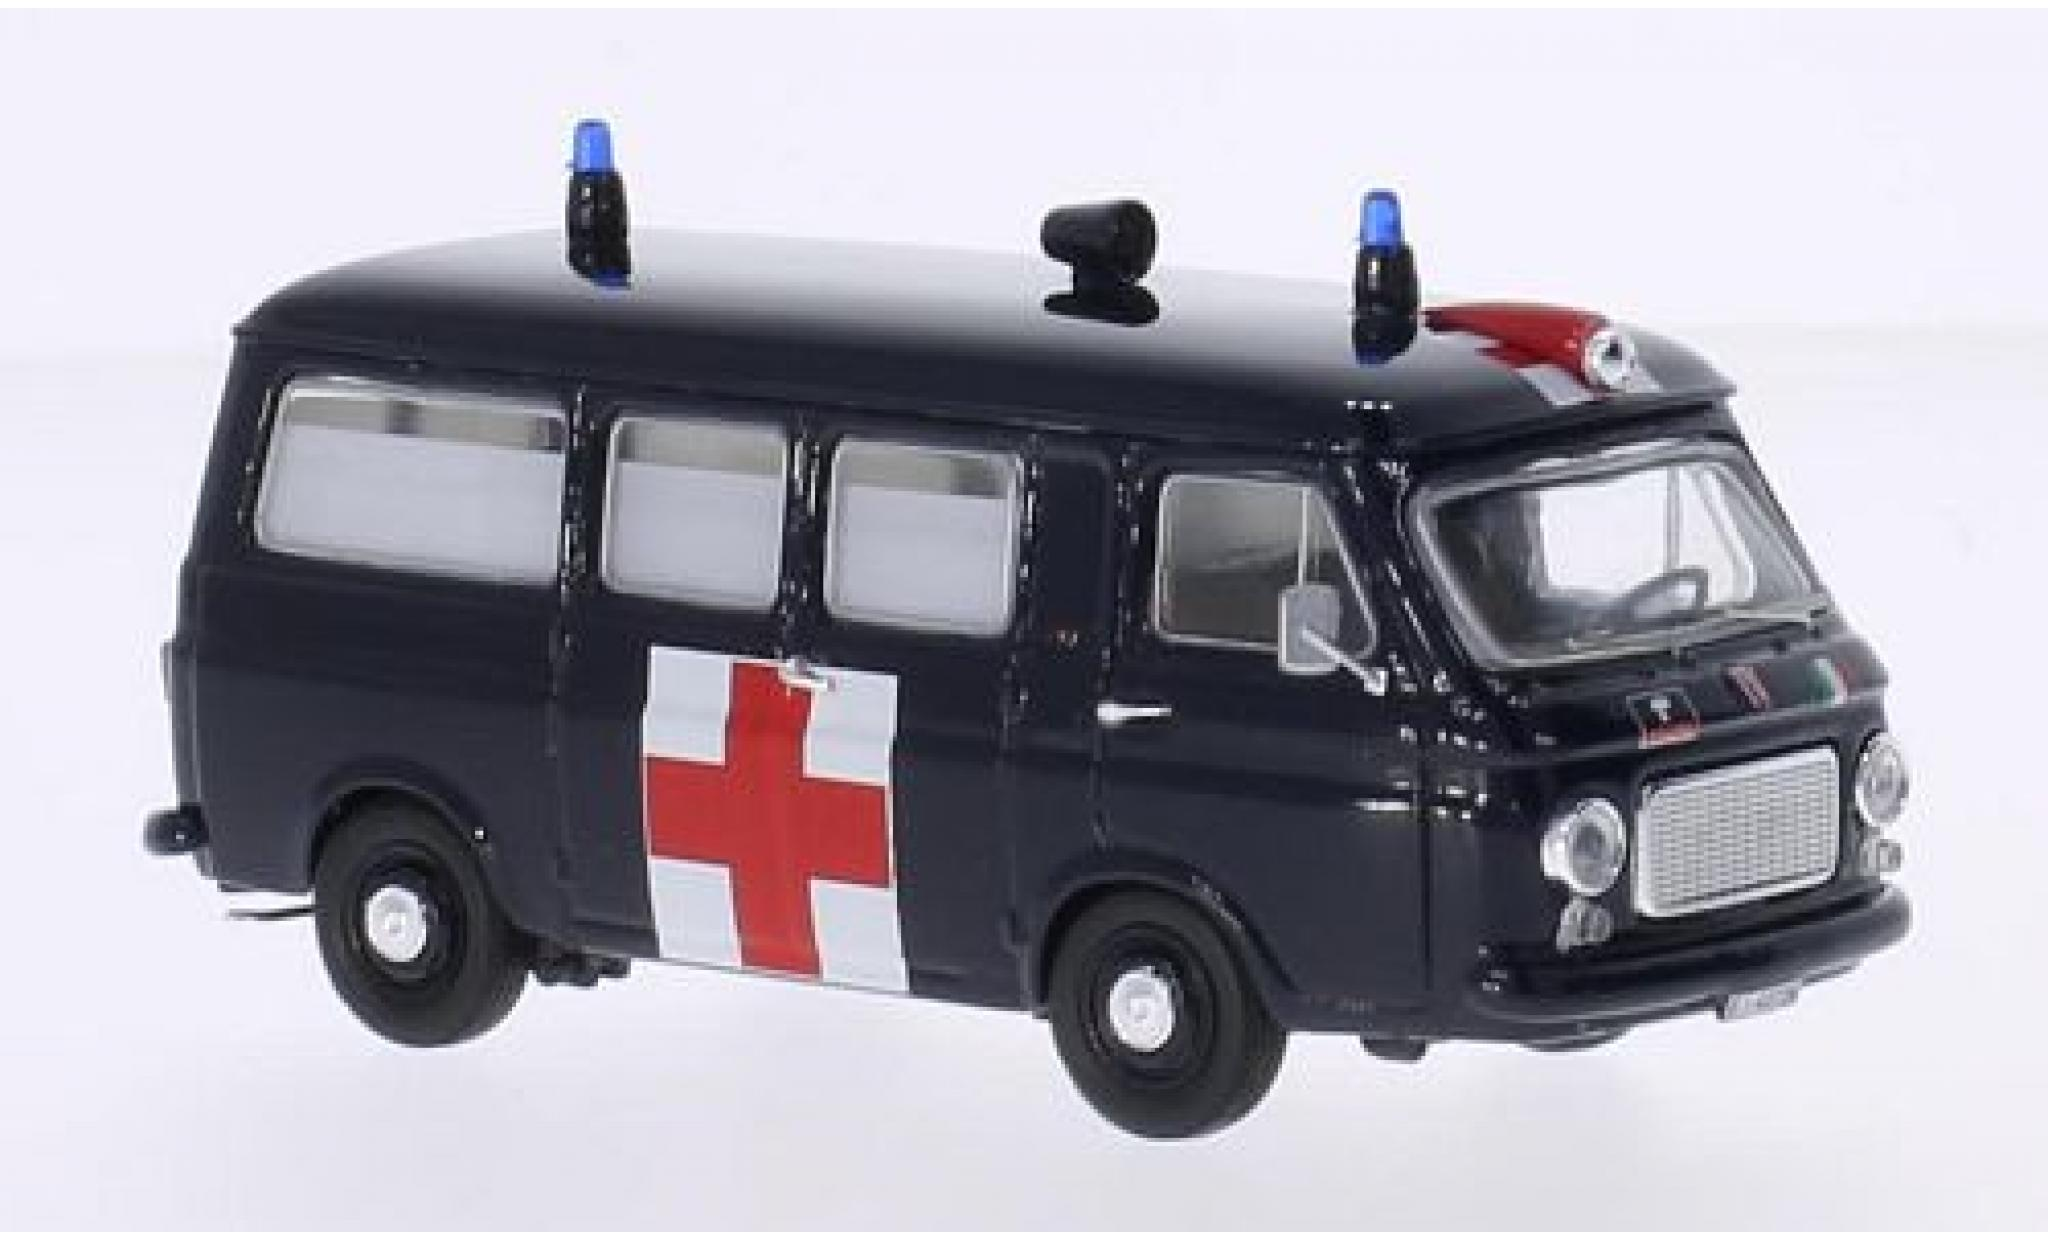 Fiat 238 1/43 Rio Ambulanza Carabinieri Ambulance (I)